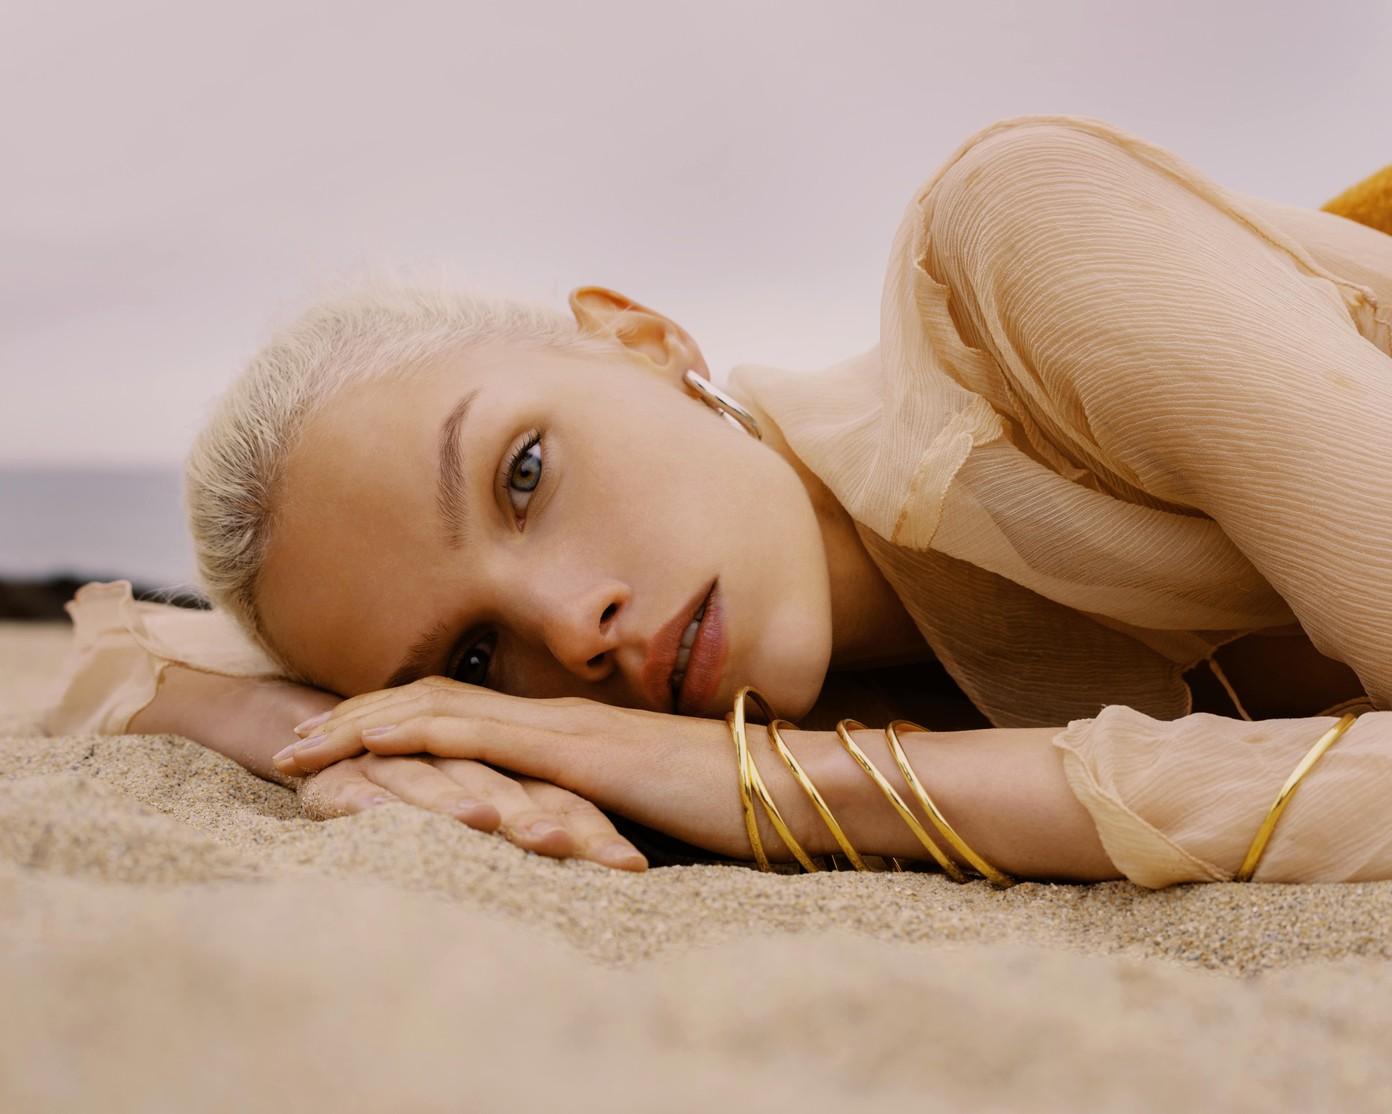 Kate Lapochkina by Denis Boulze